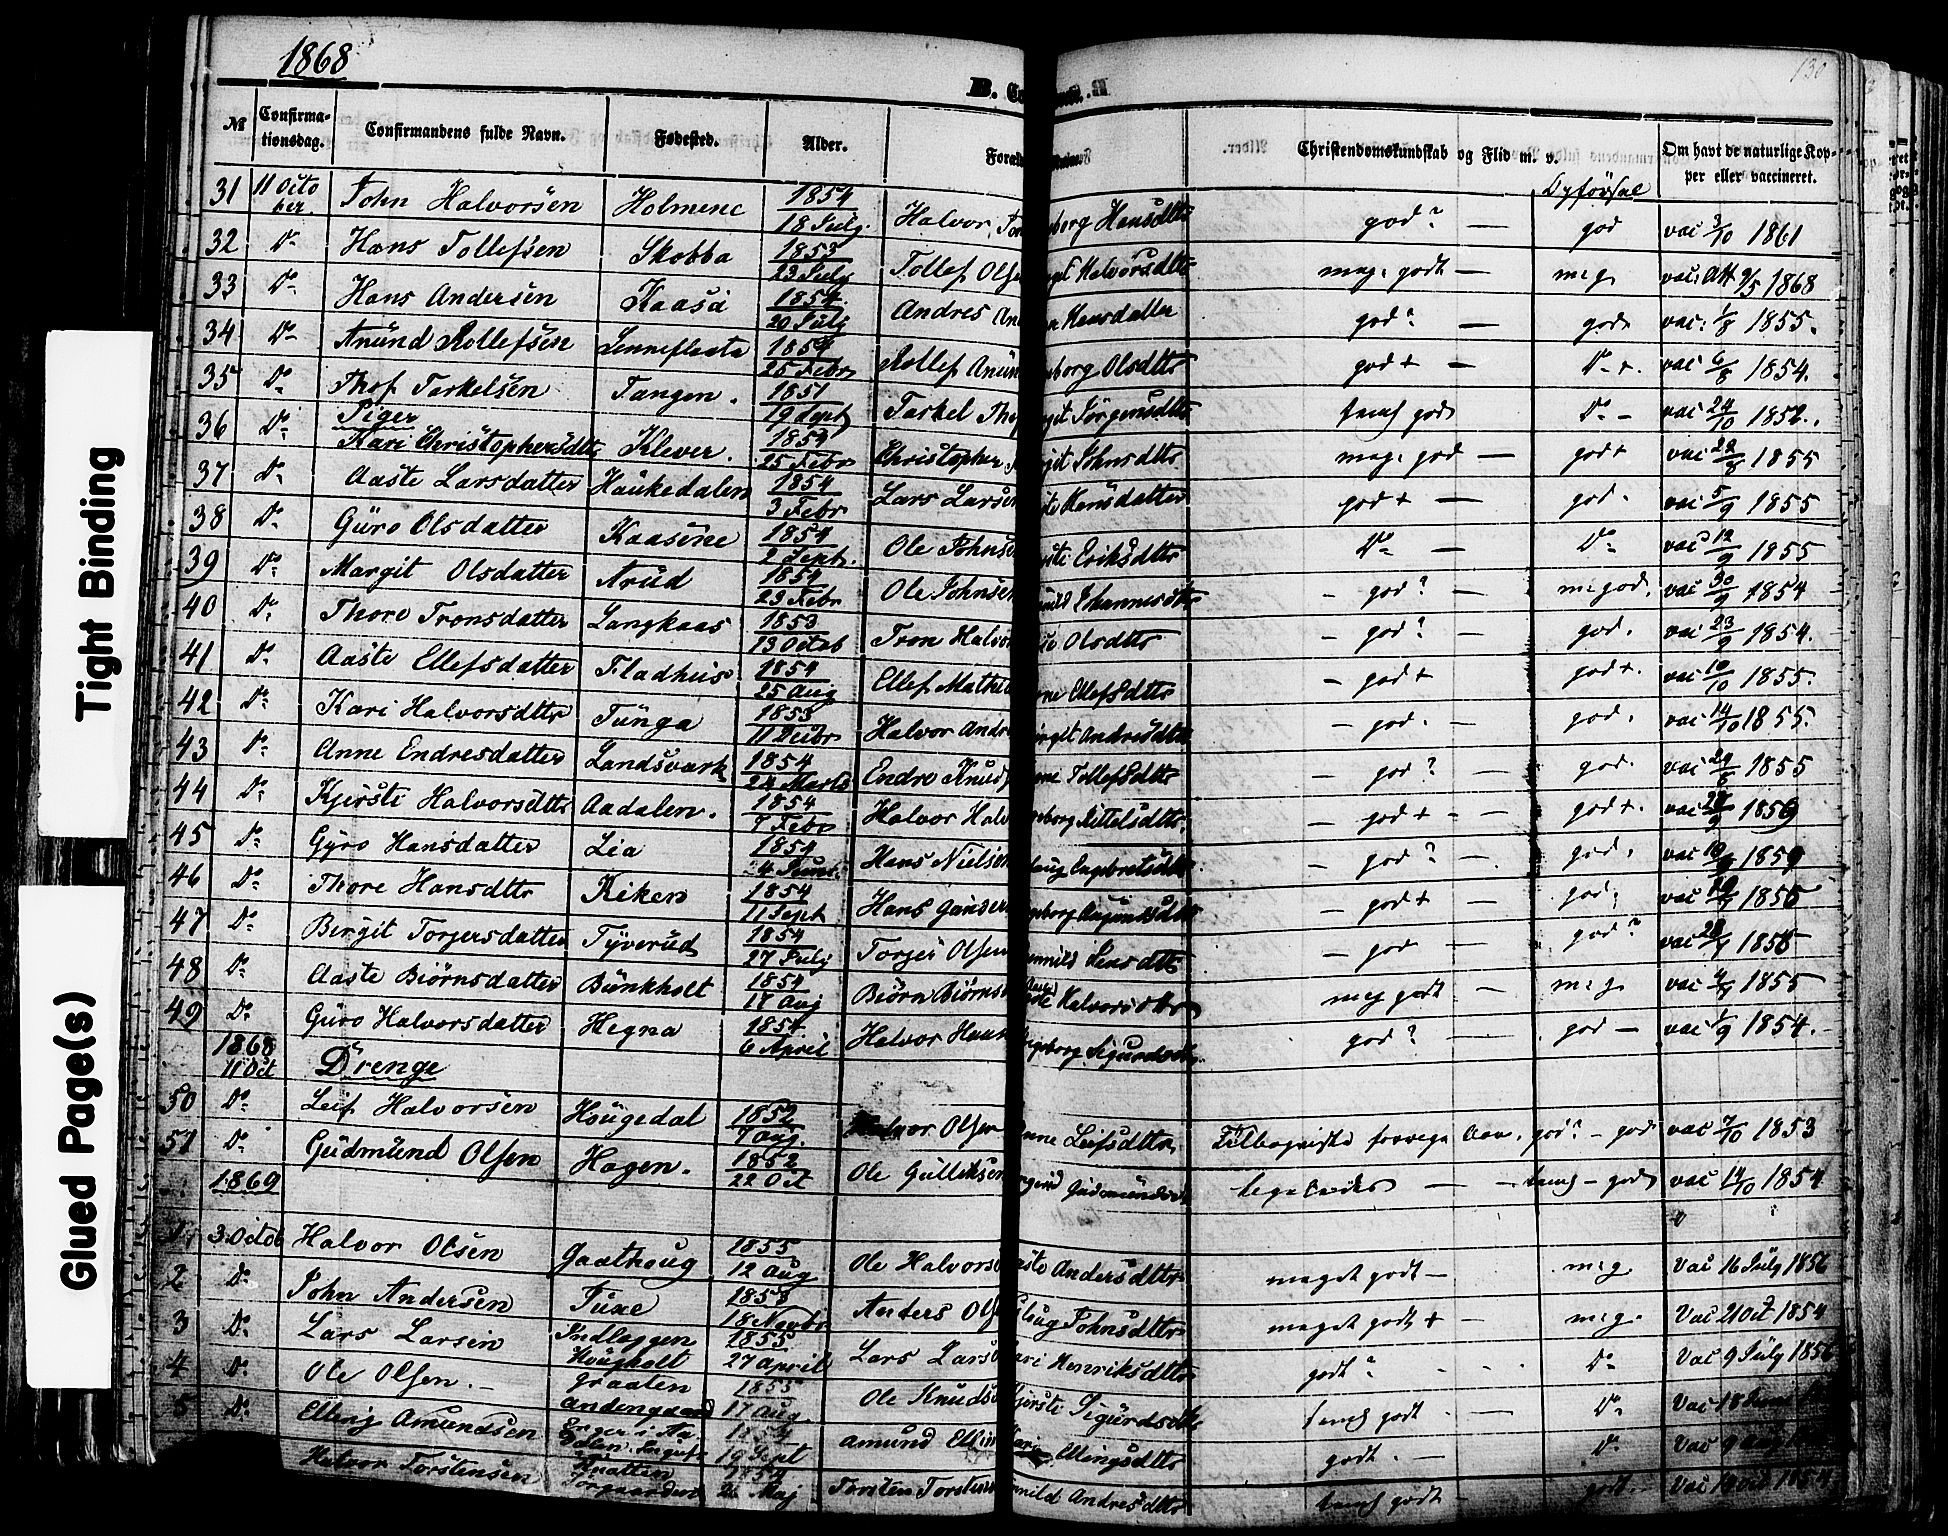 SAKO, Sauherad kirkebøker, F/Fa/L0007: Ministerialbok nr. I 7, 1851-1873, s. 130